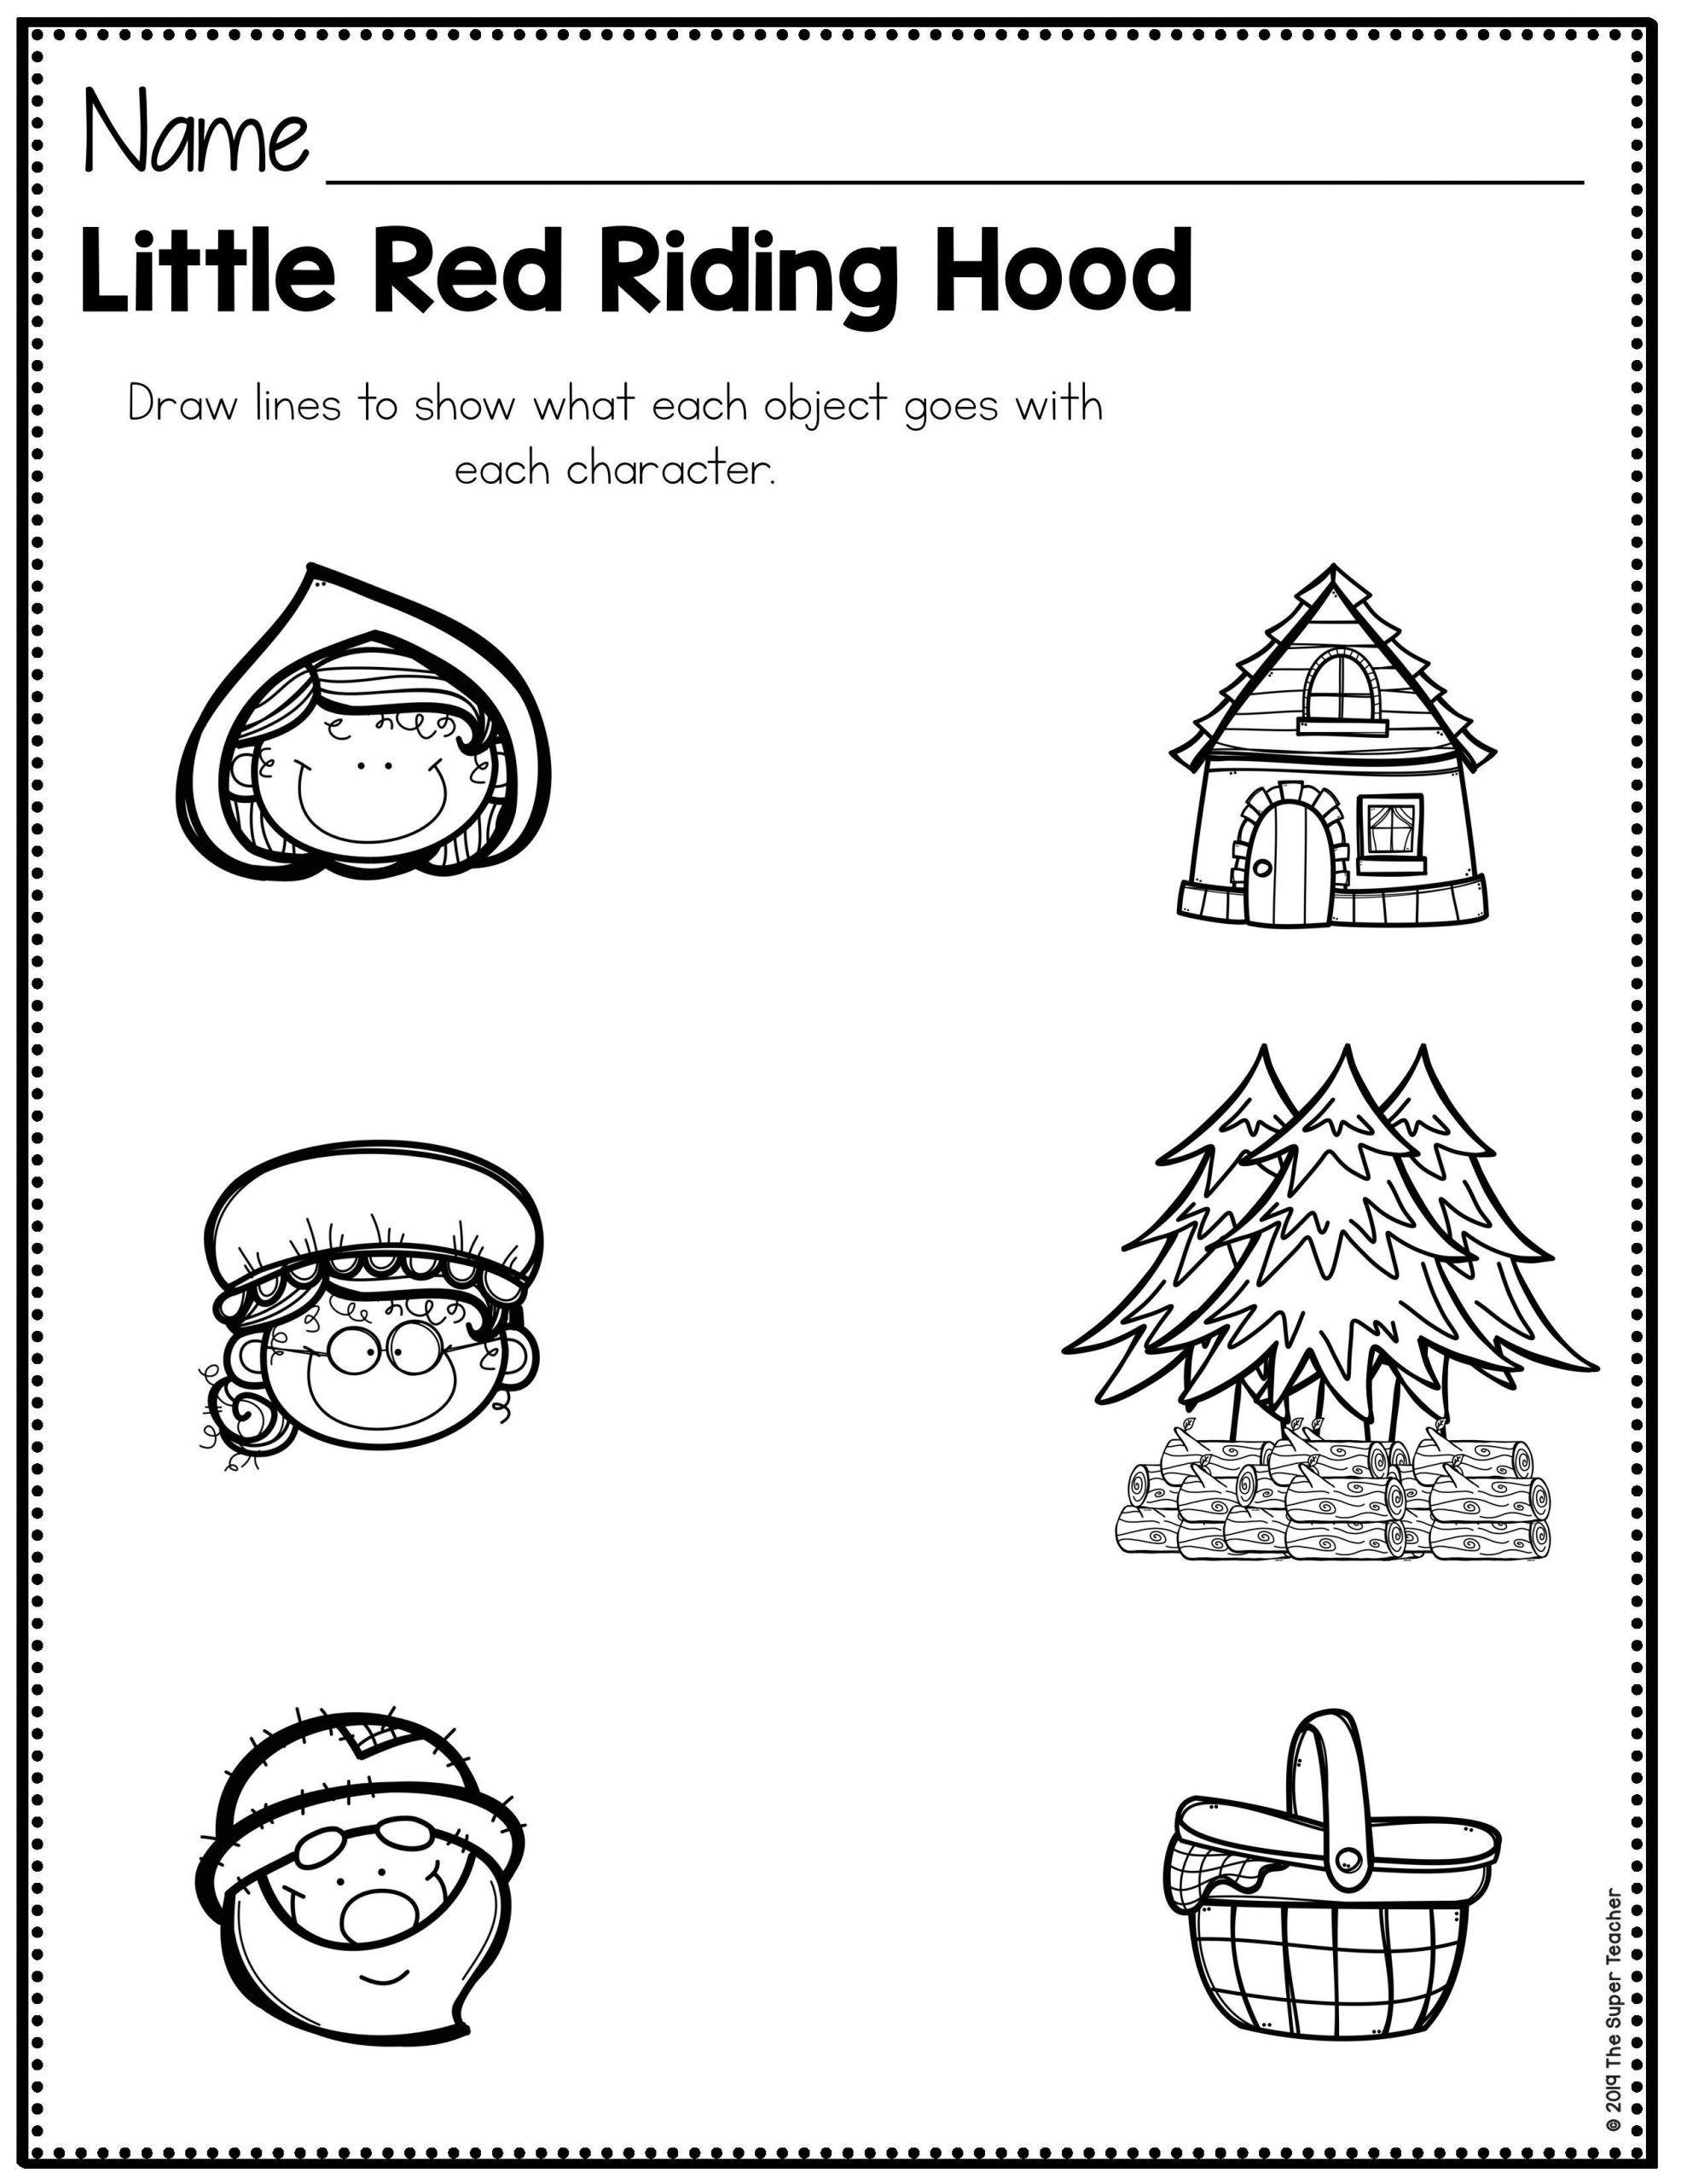 Kindergarten Story Retelling Worksheets Worksheet For Kindergarten Teaching Story Elements Story Retell Little Red Riding Hood [ 2560 x 1978 Pixel ]